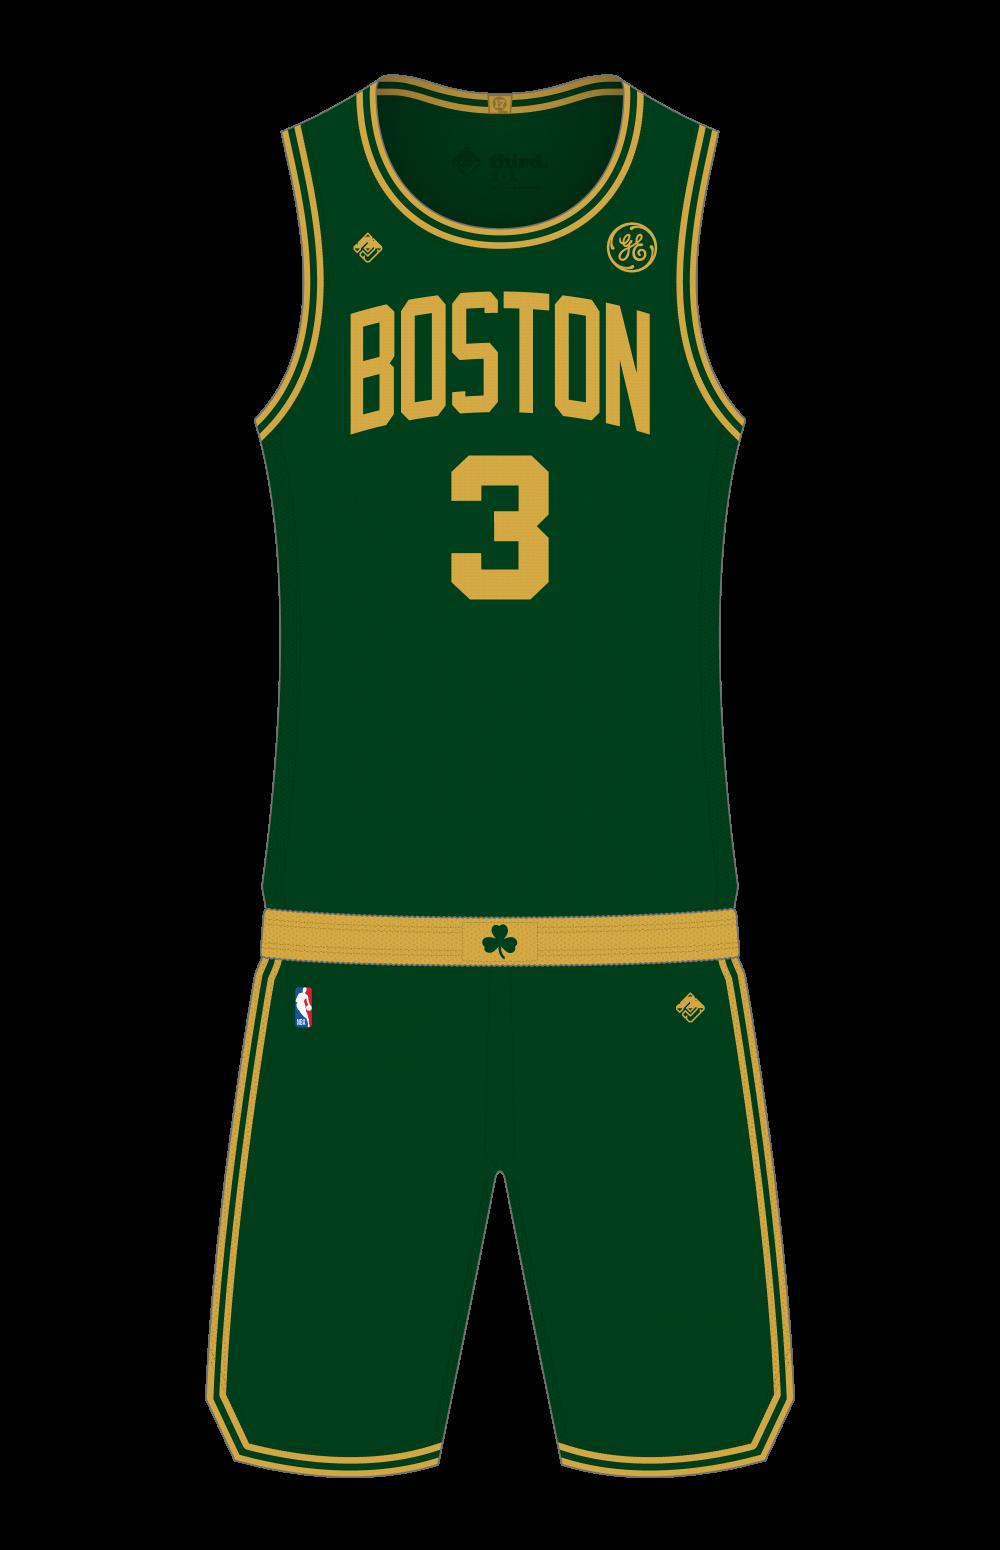 Boston Celtics Statement Edition